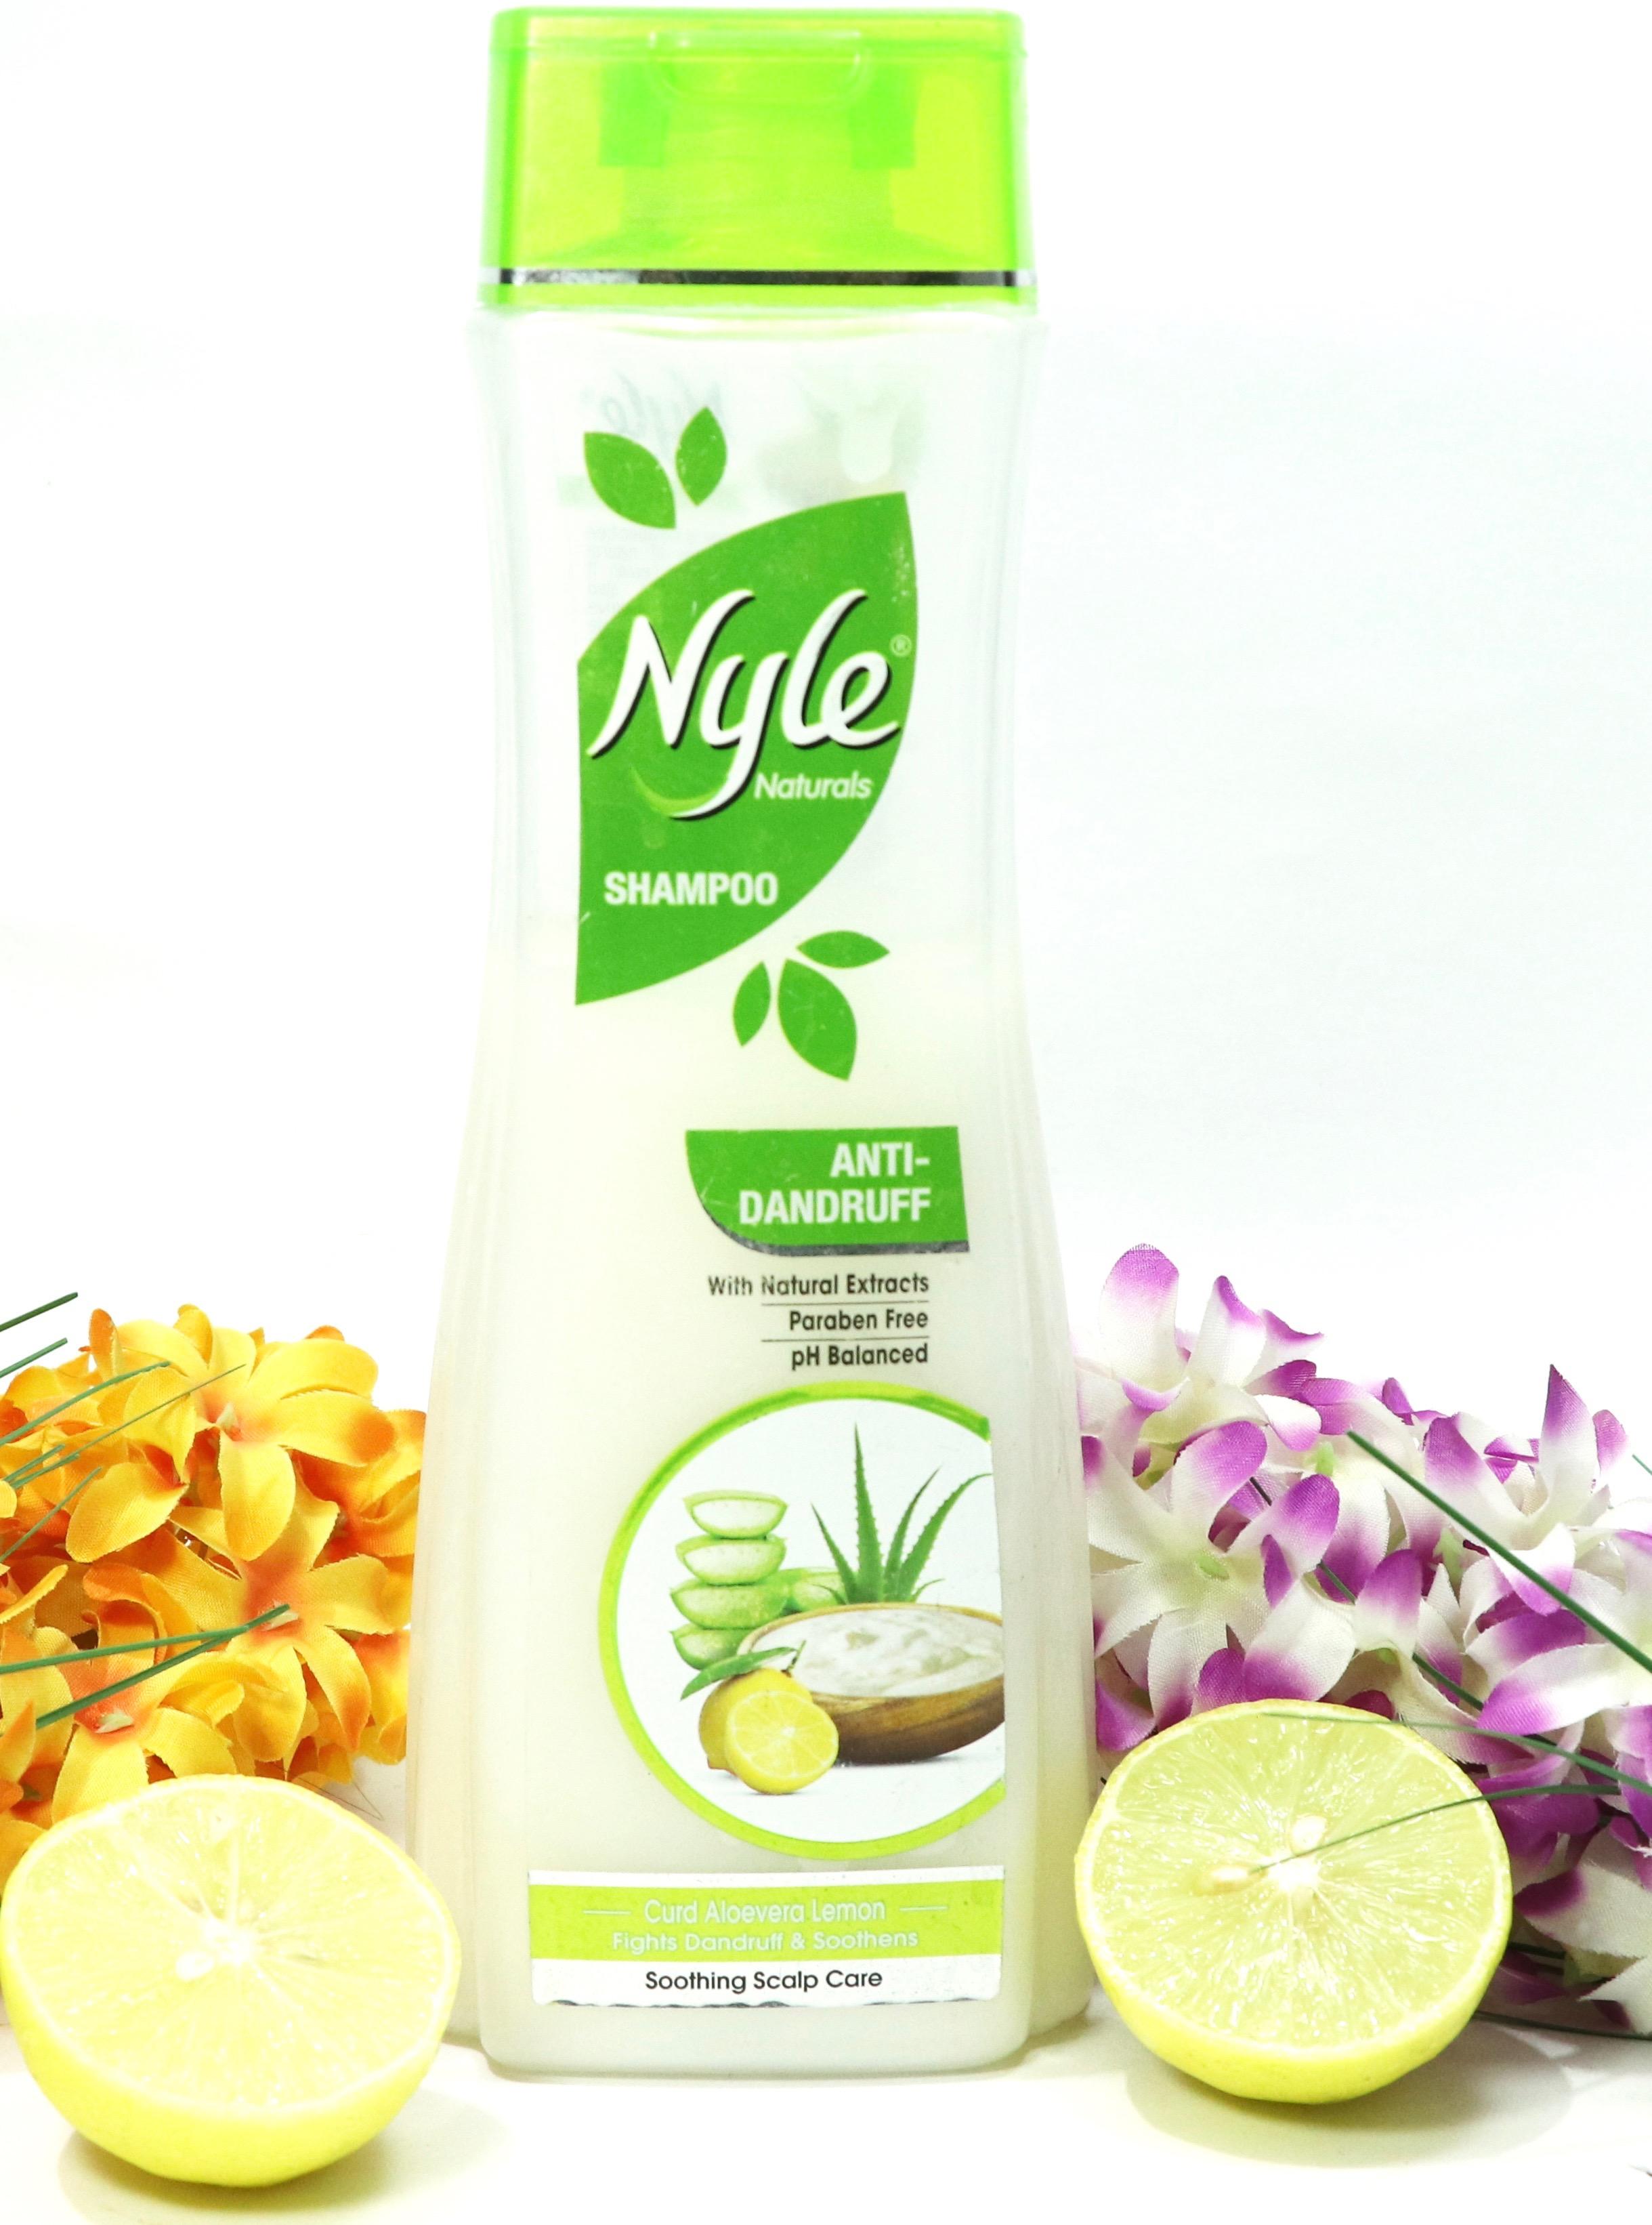 Health Naturals Website Review